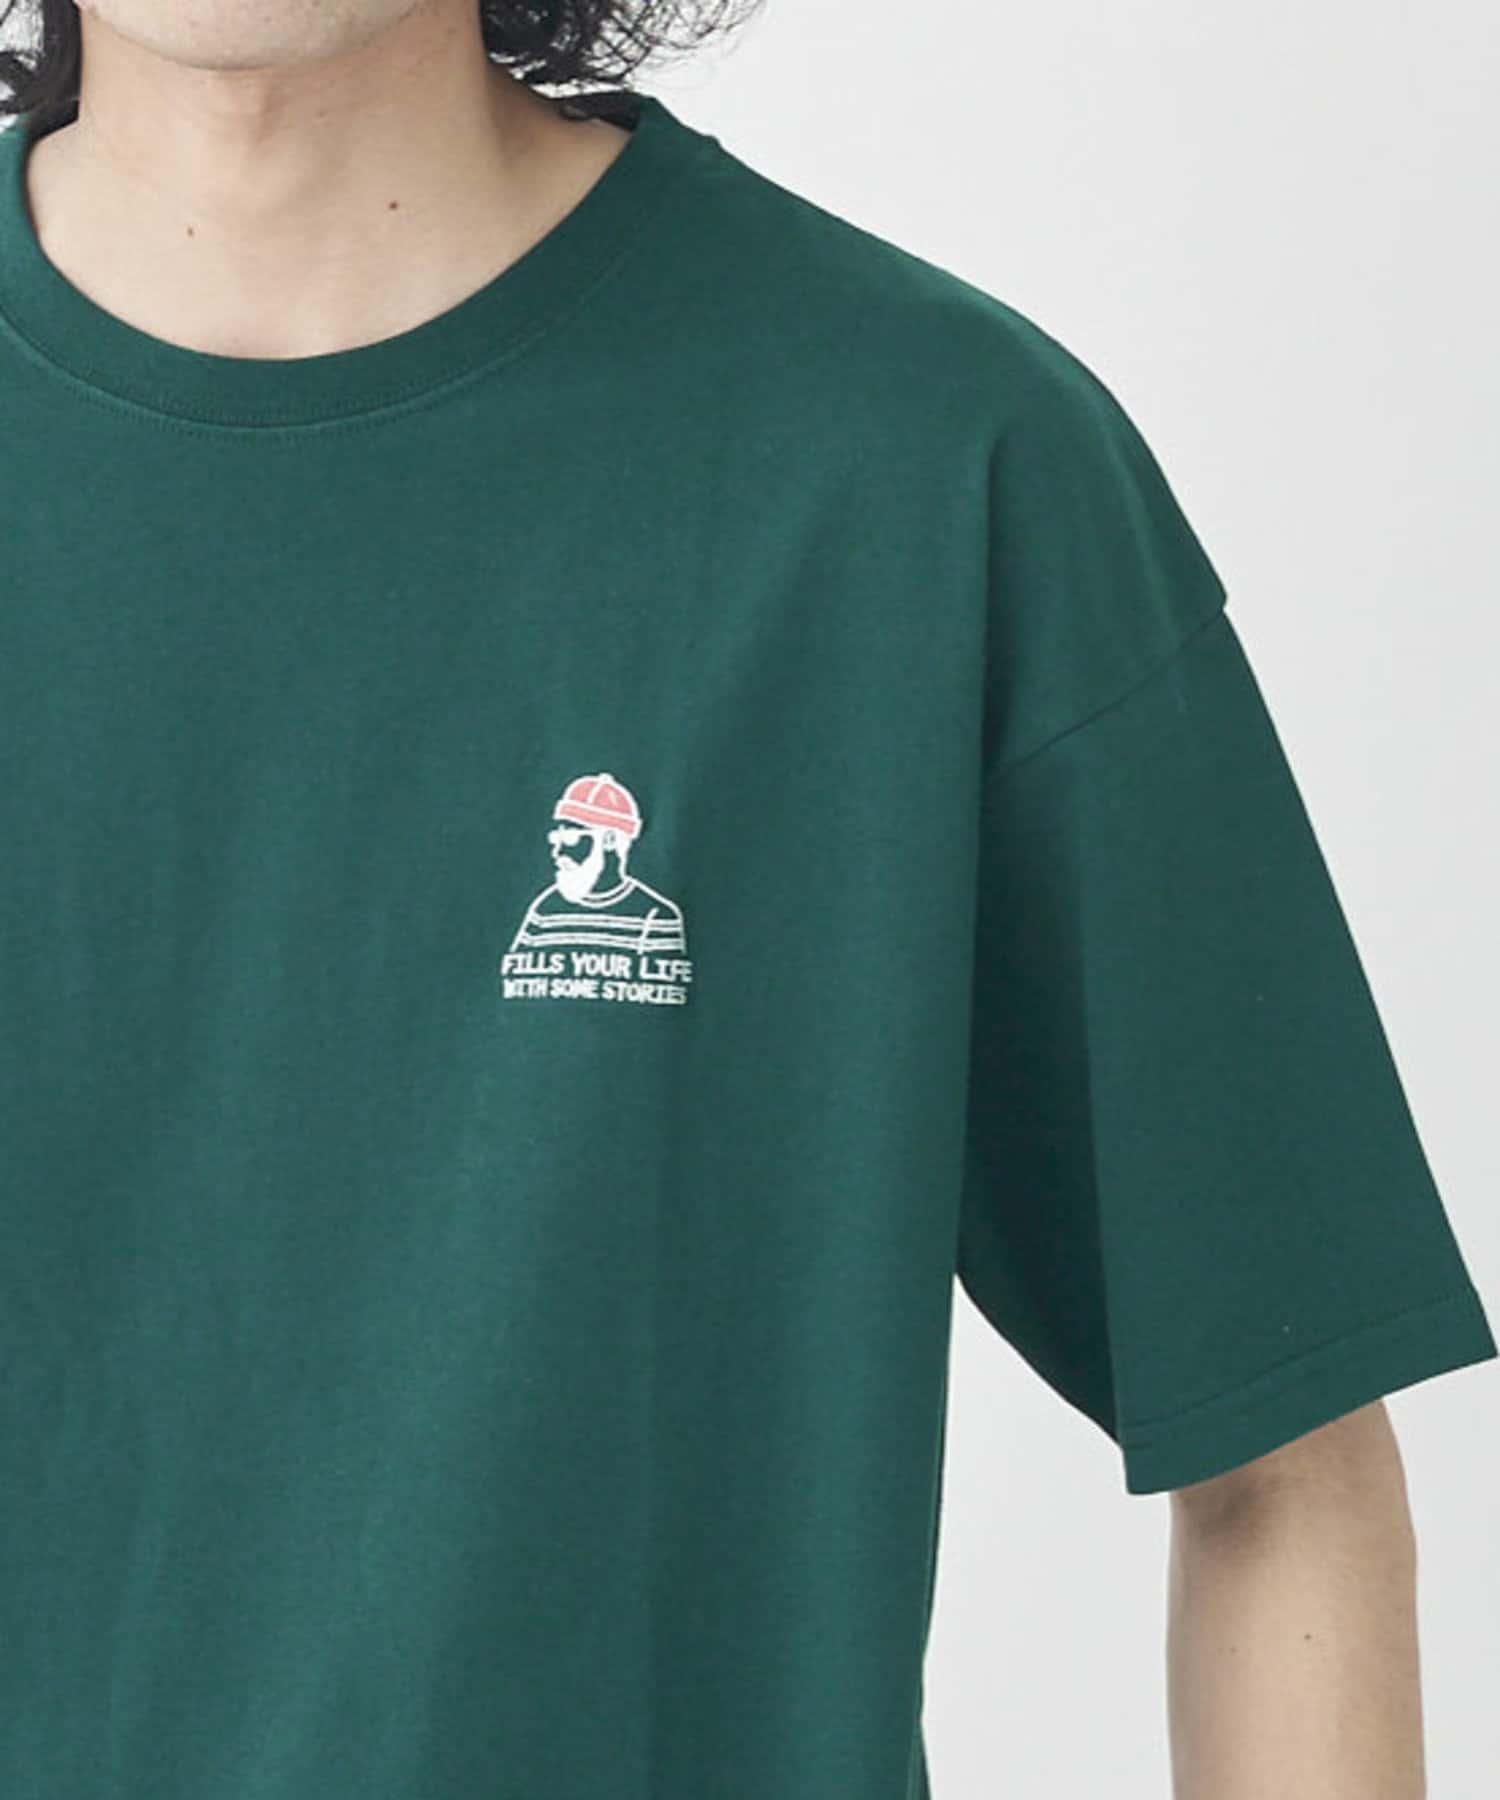 CPCM(シーピーシーエム) 1ポイント半袖刺繍T【一部予約商品】